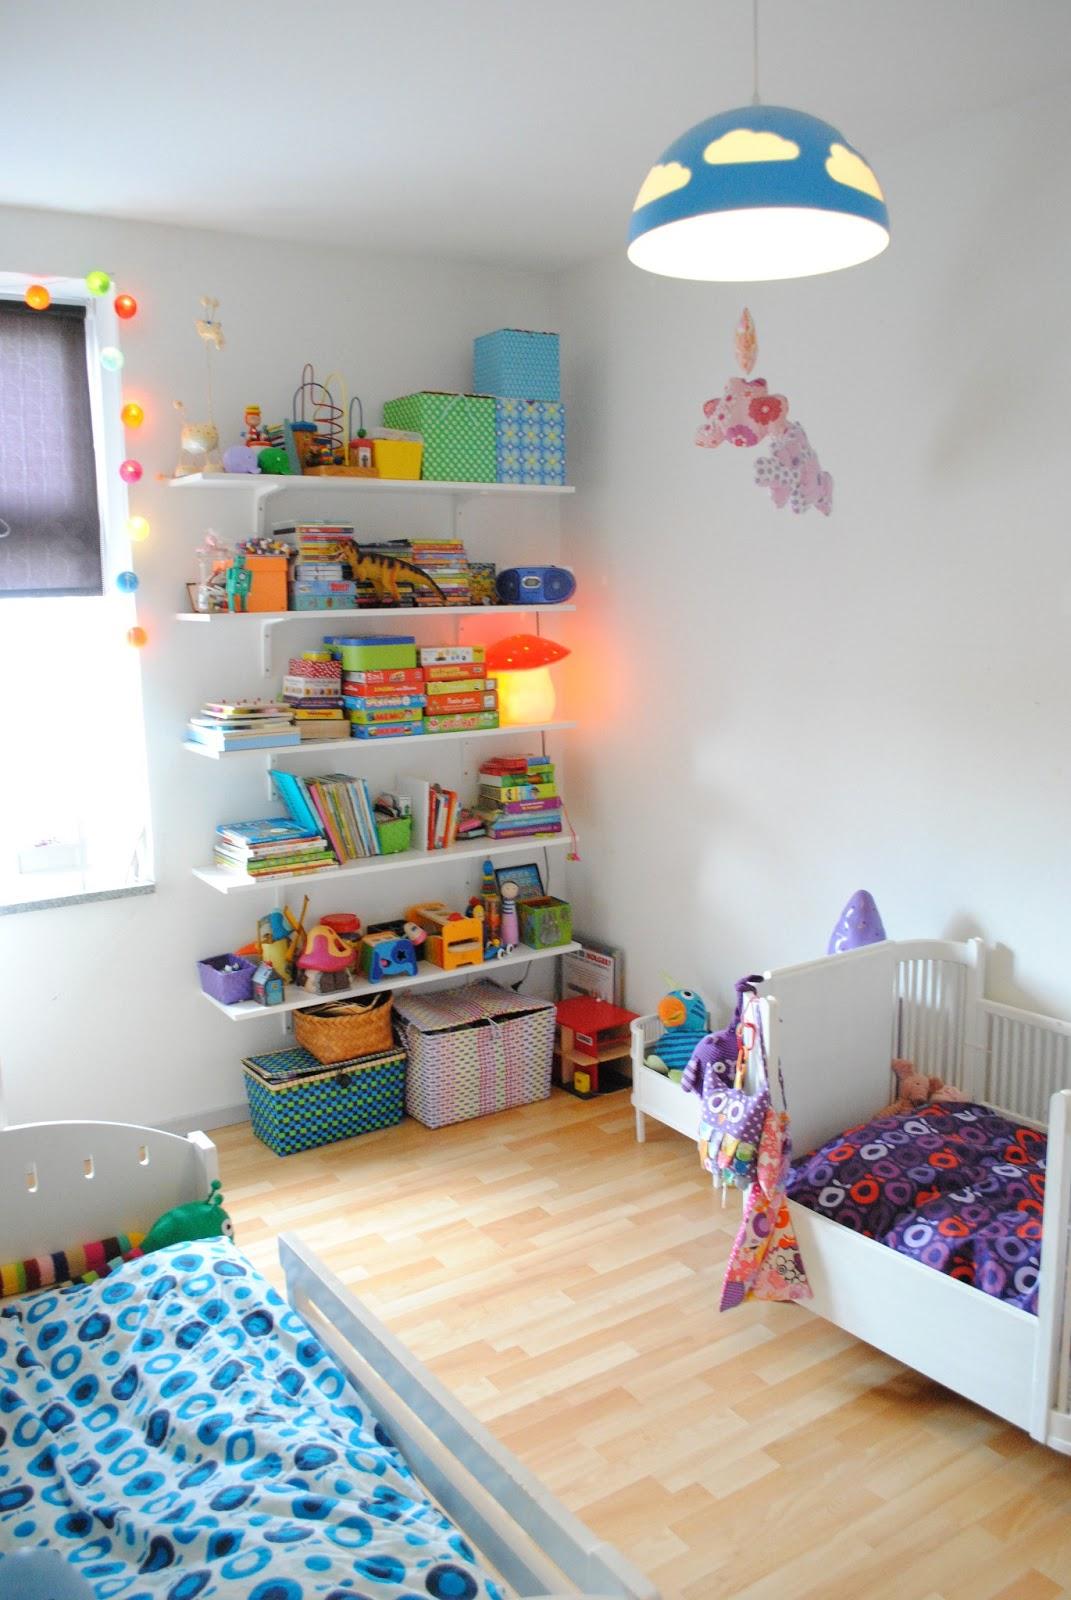 hylder børneværelse Hylder børneværelse – Design et barns værelse hylder børneværelse